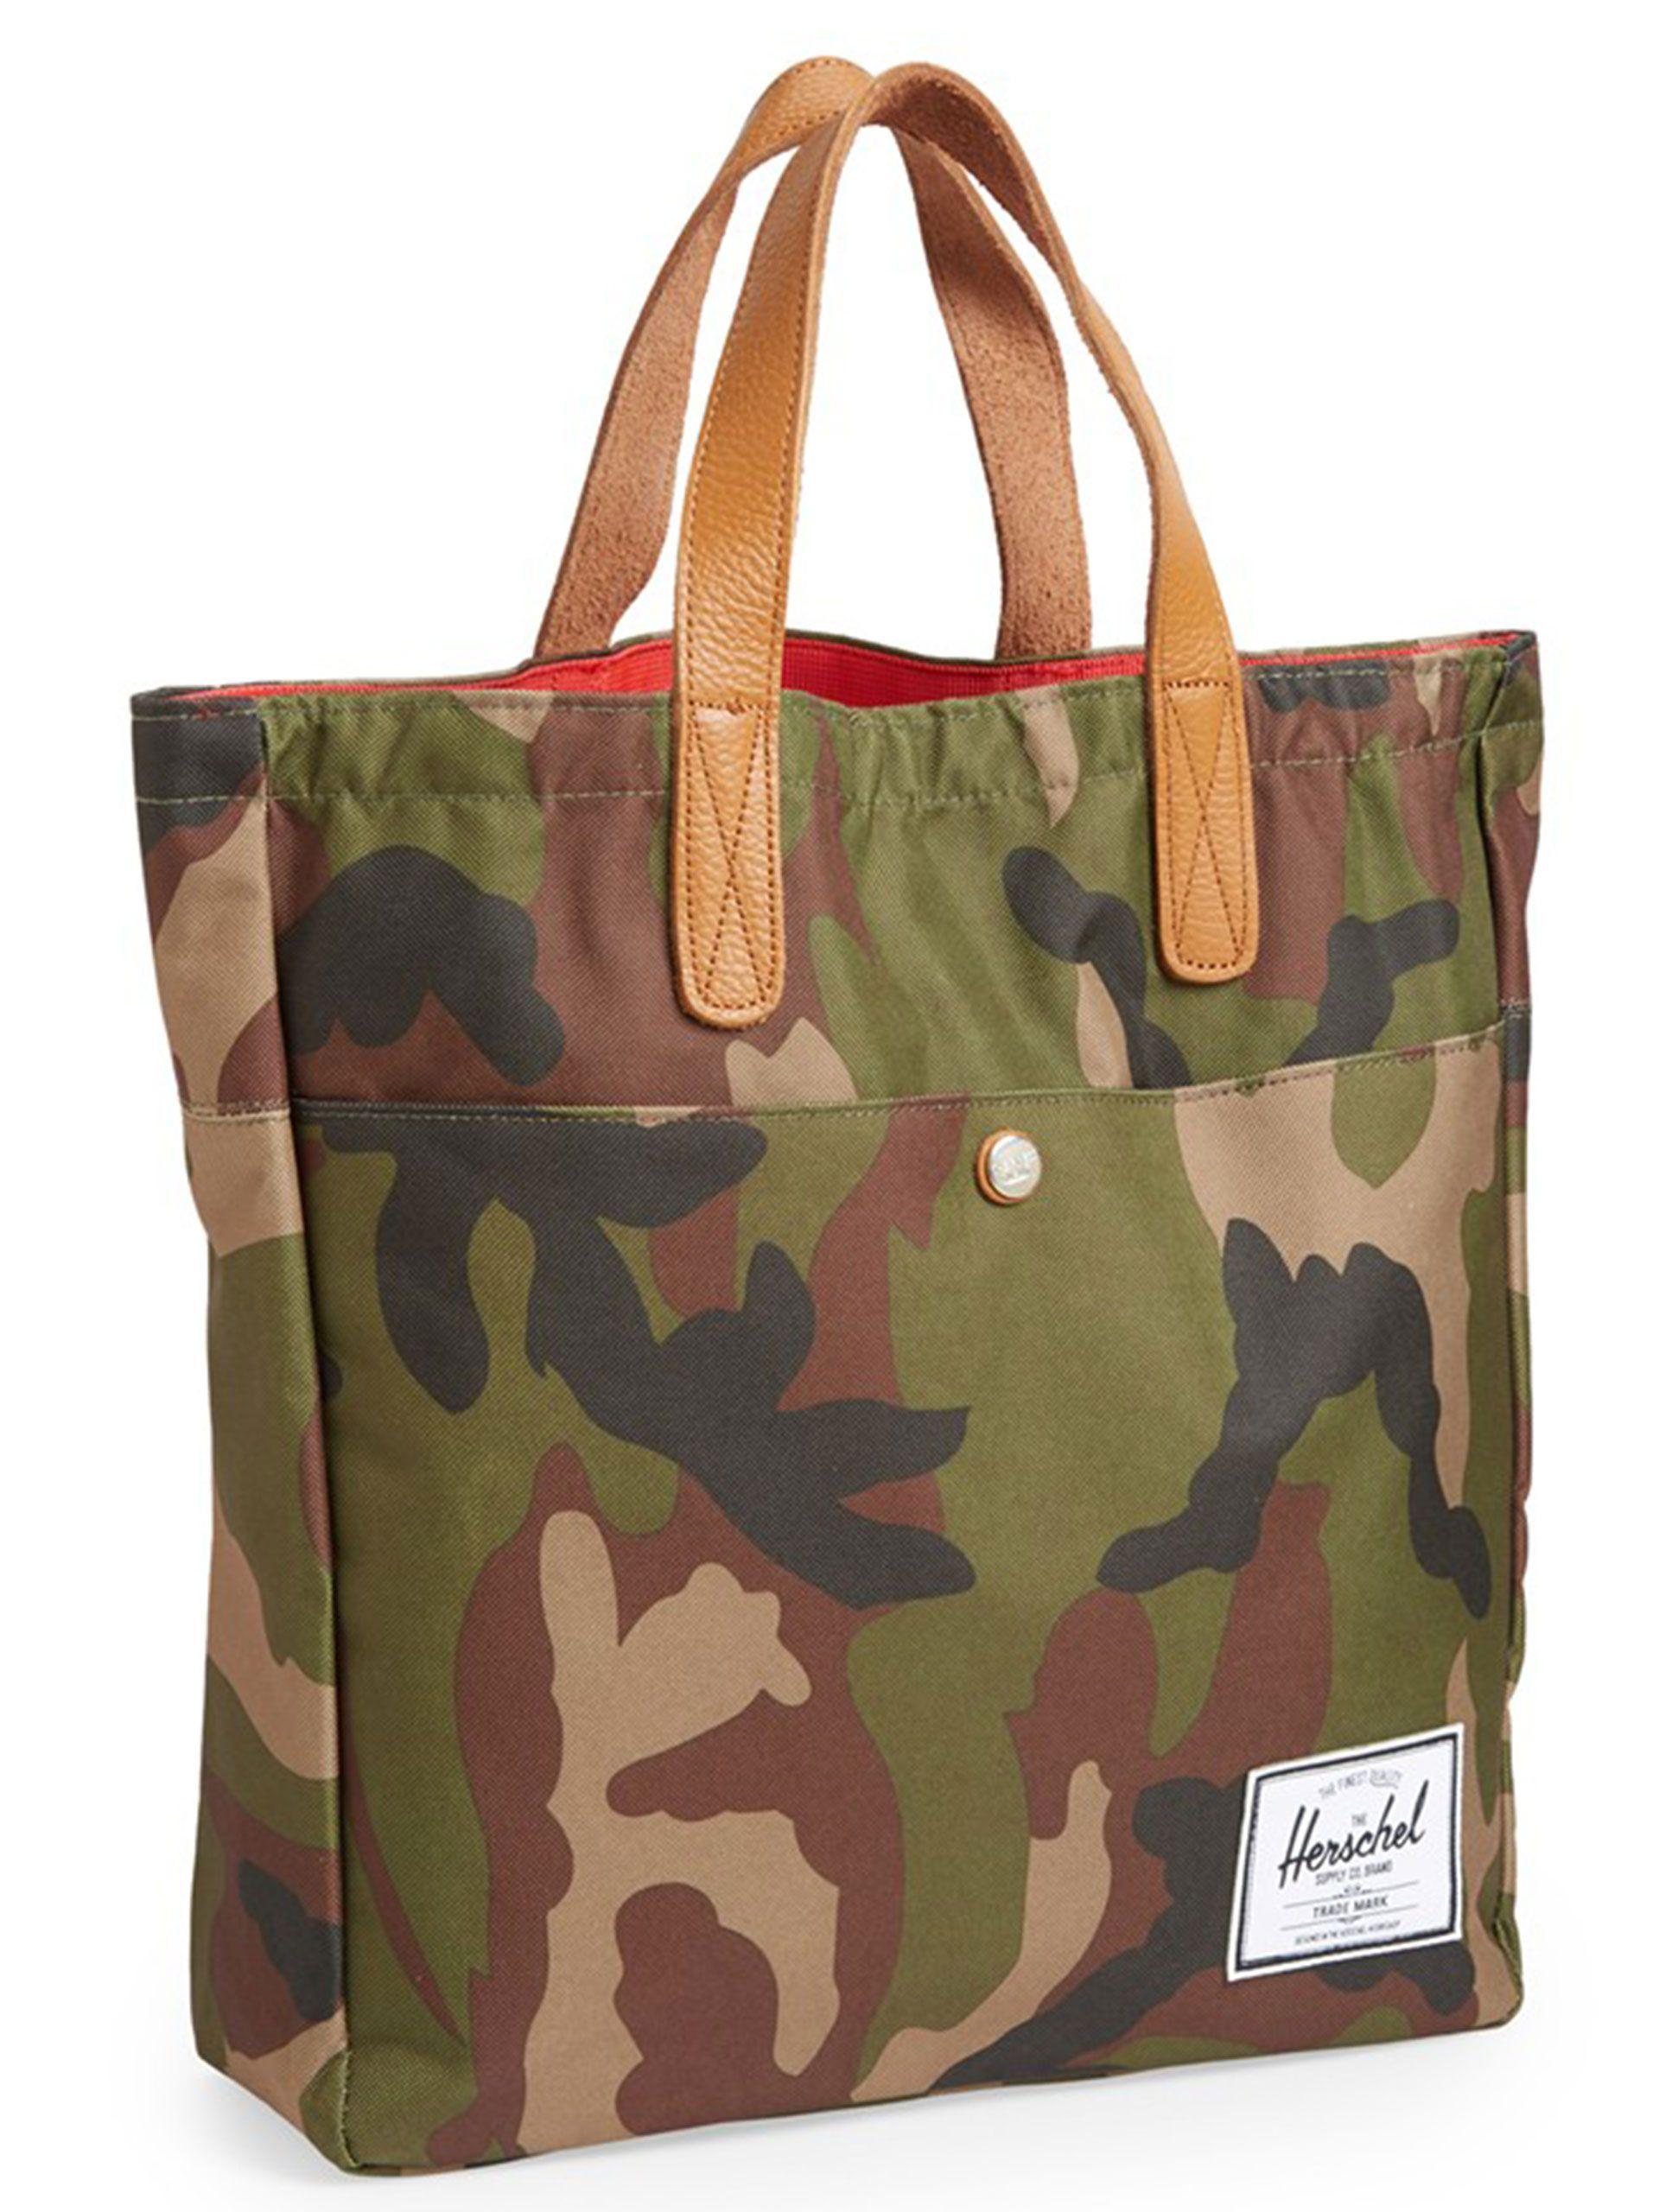 1d1e4b764716 Jack Spade 'Coal' Camo Tote Bag available at #Nordstrom | Men's Fashion |  Bags, Camo bag, Jack spade